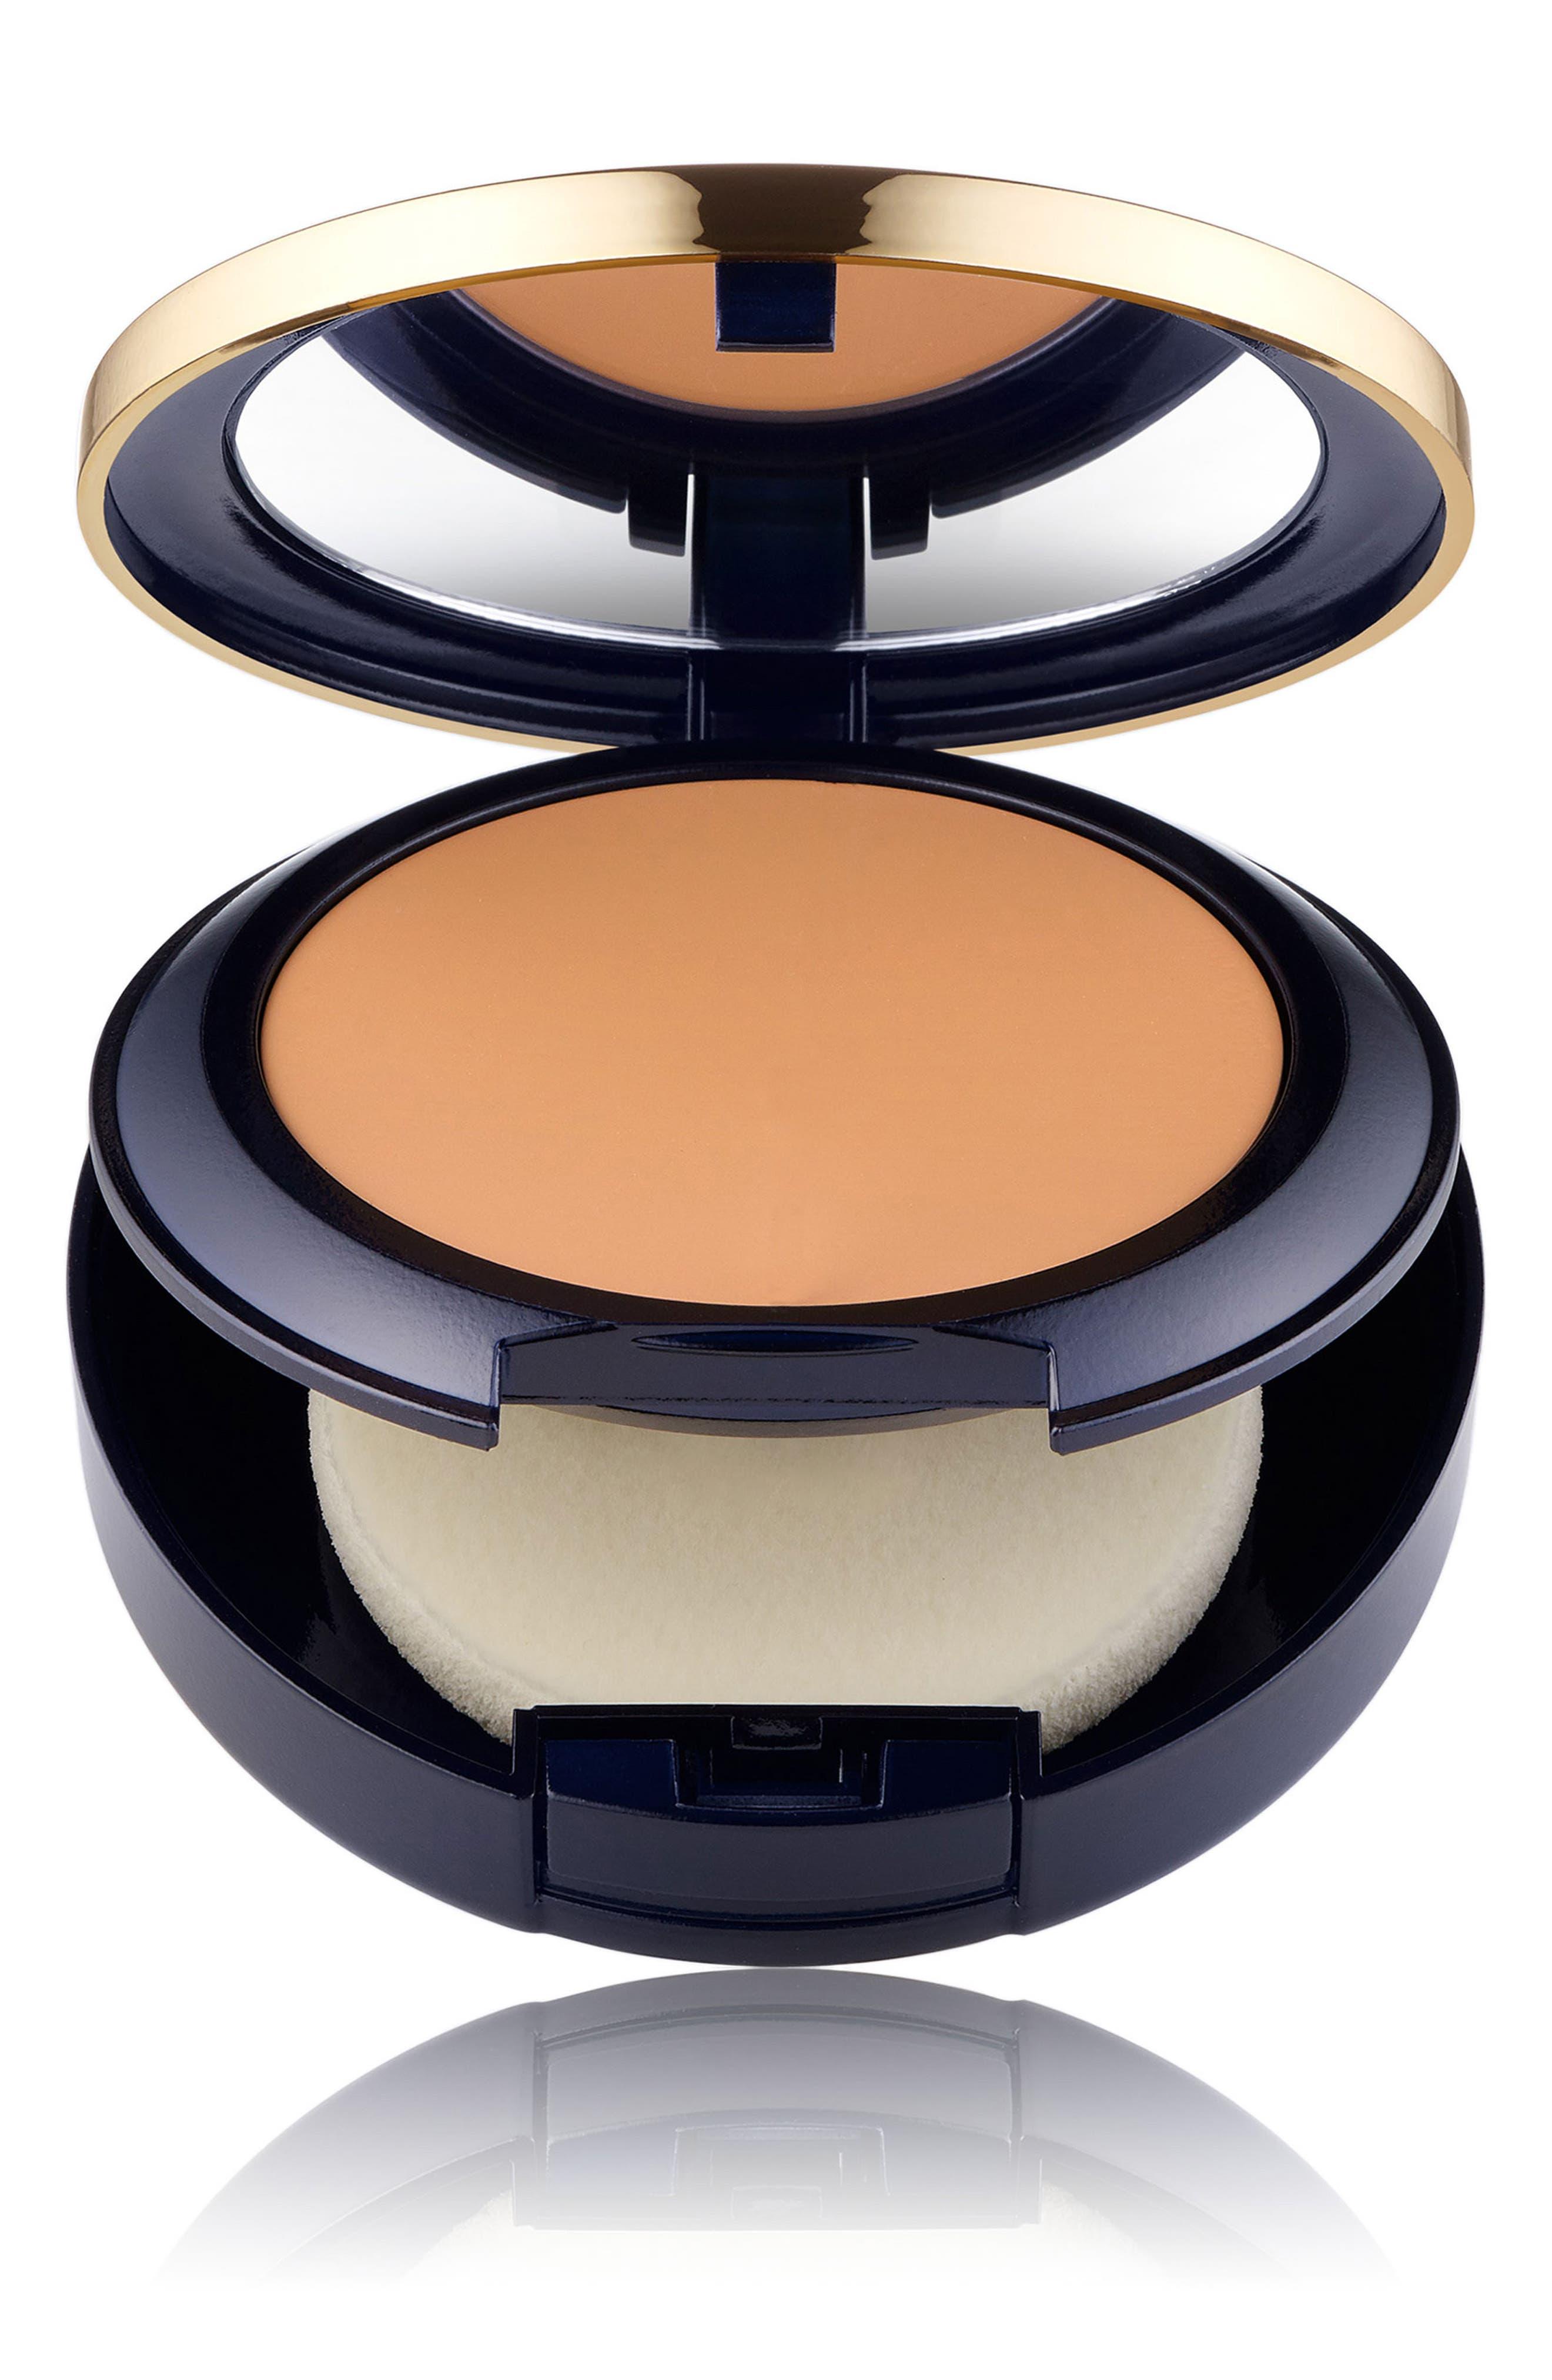 Estee Lauder Double Wear Stay In Place Matte Powder Foundation - 5C1 Rich Chestnut